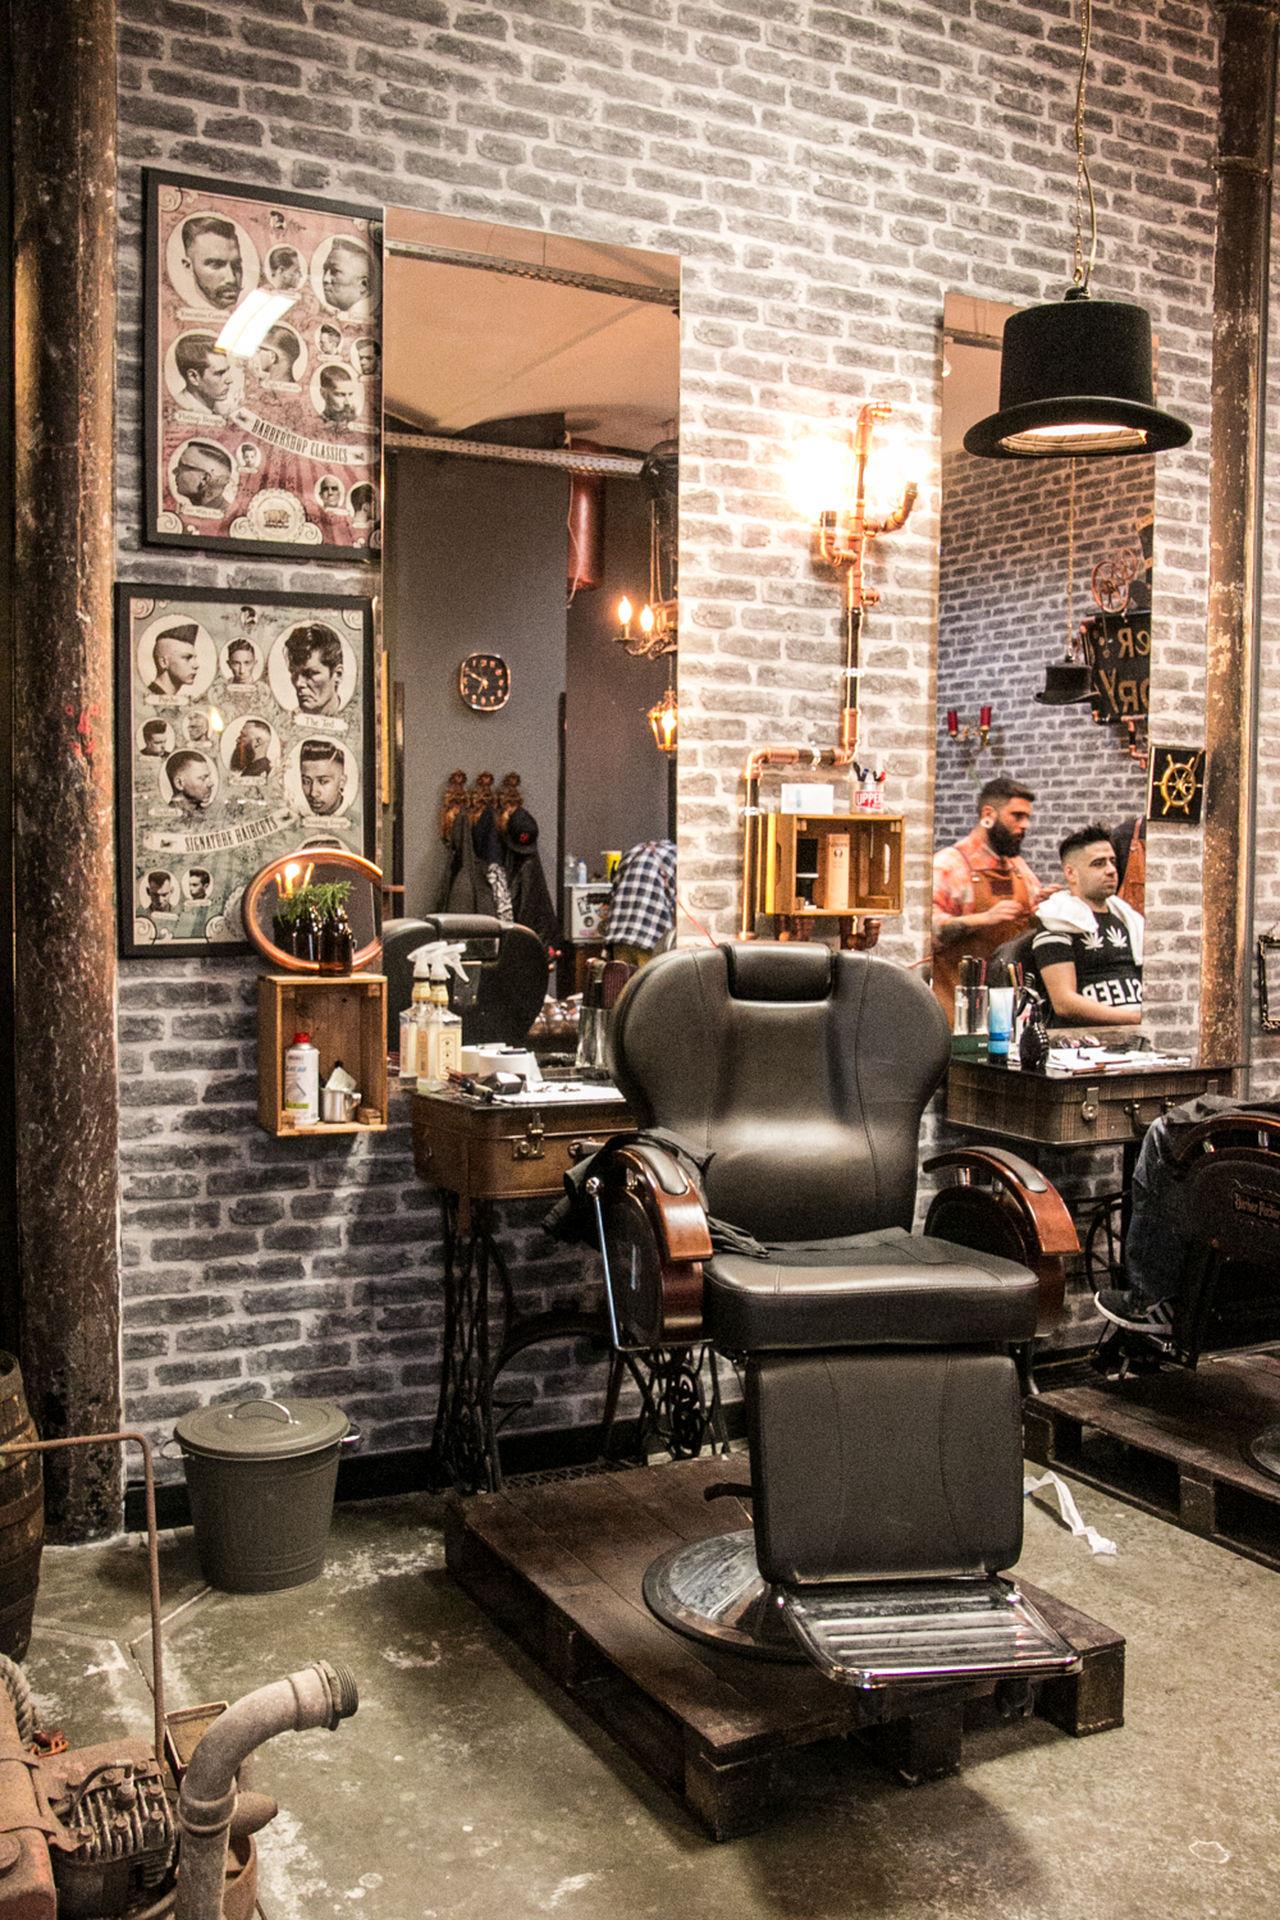 Barber Barber Factory Barber Shop Barbershop BART Beard Chic Friseur Hairdresser Lisbon Lissabon Lx Factory Men Menstyle Shop Style Stylish Travel Travellover